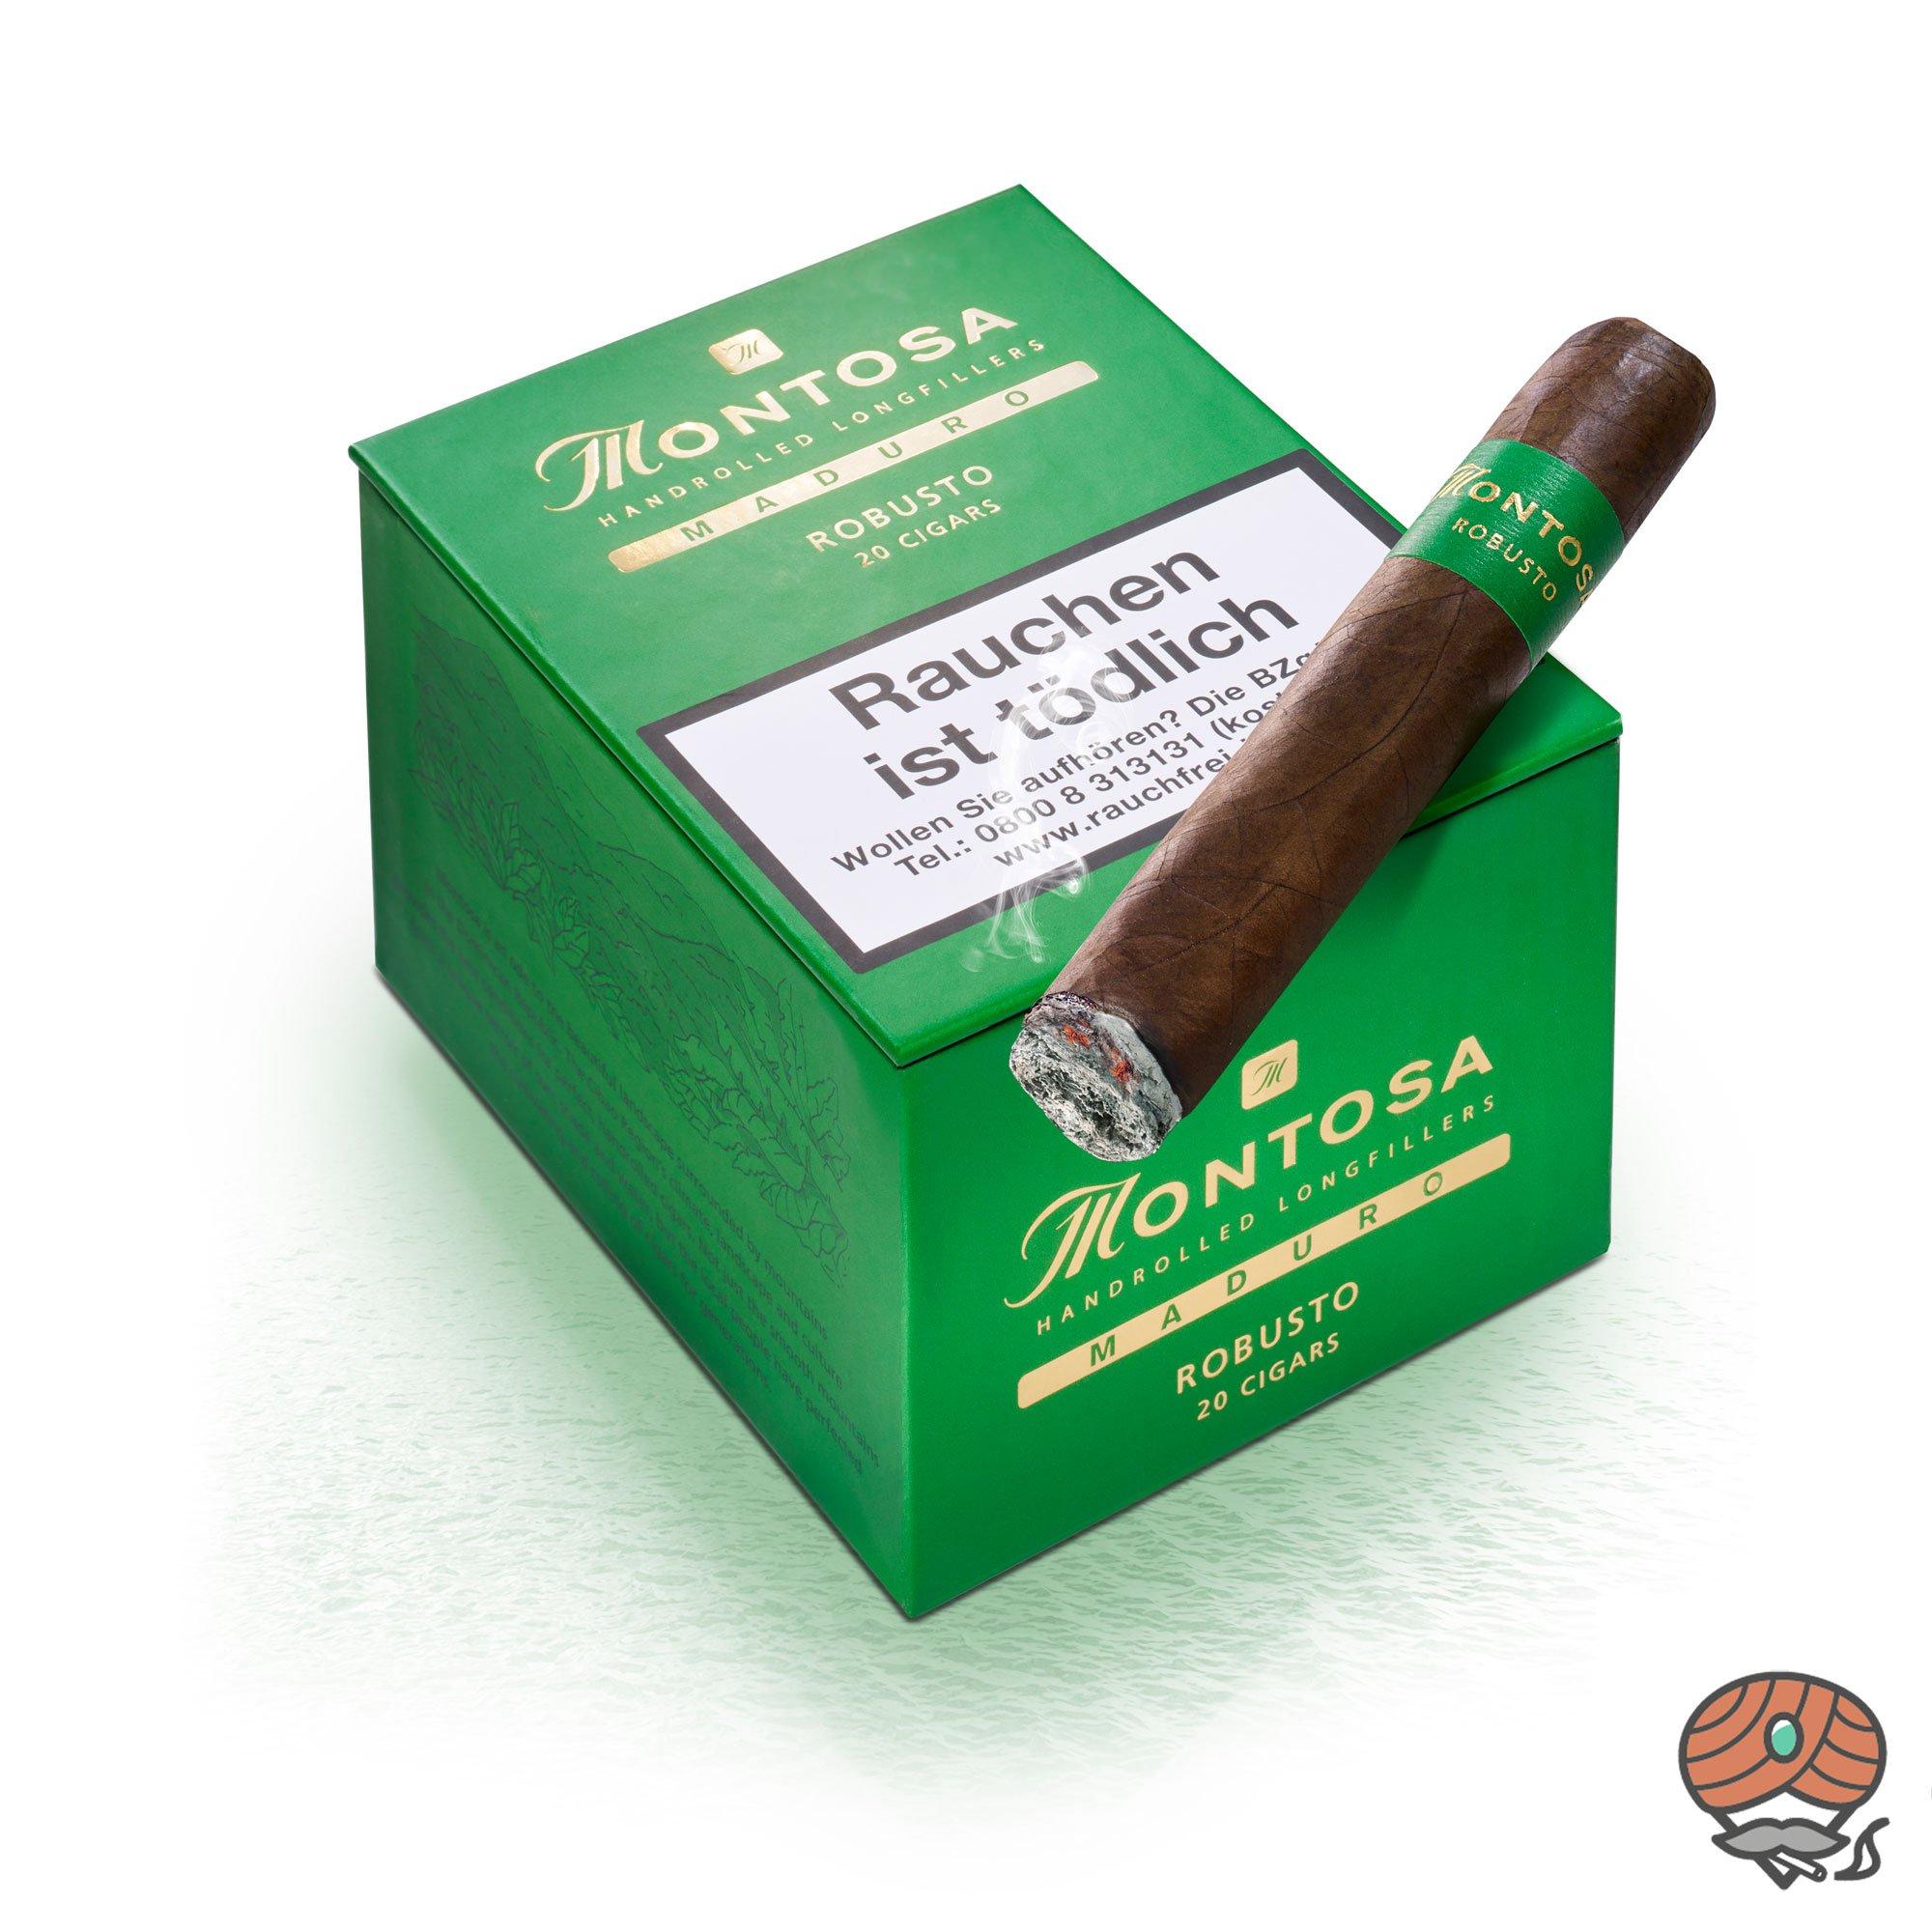 Montosa Maduro Robusto Zigarren 20 Stück, Dominikanische Republik